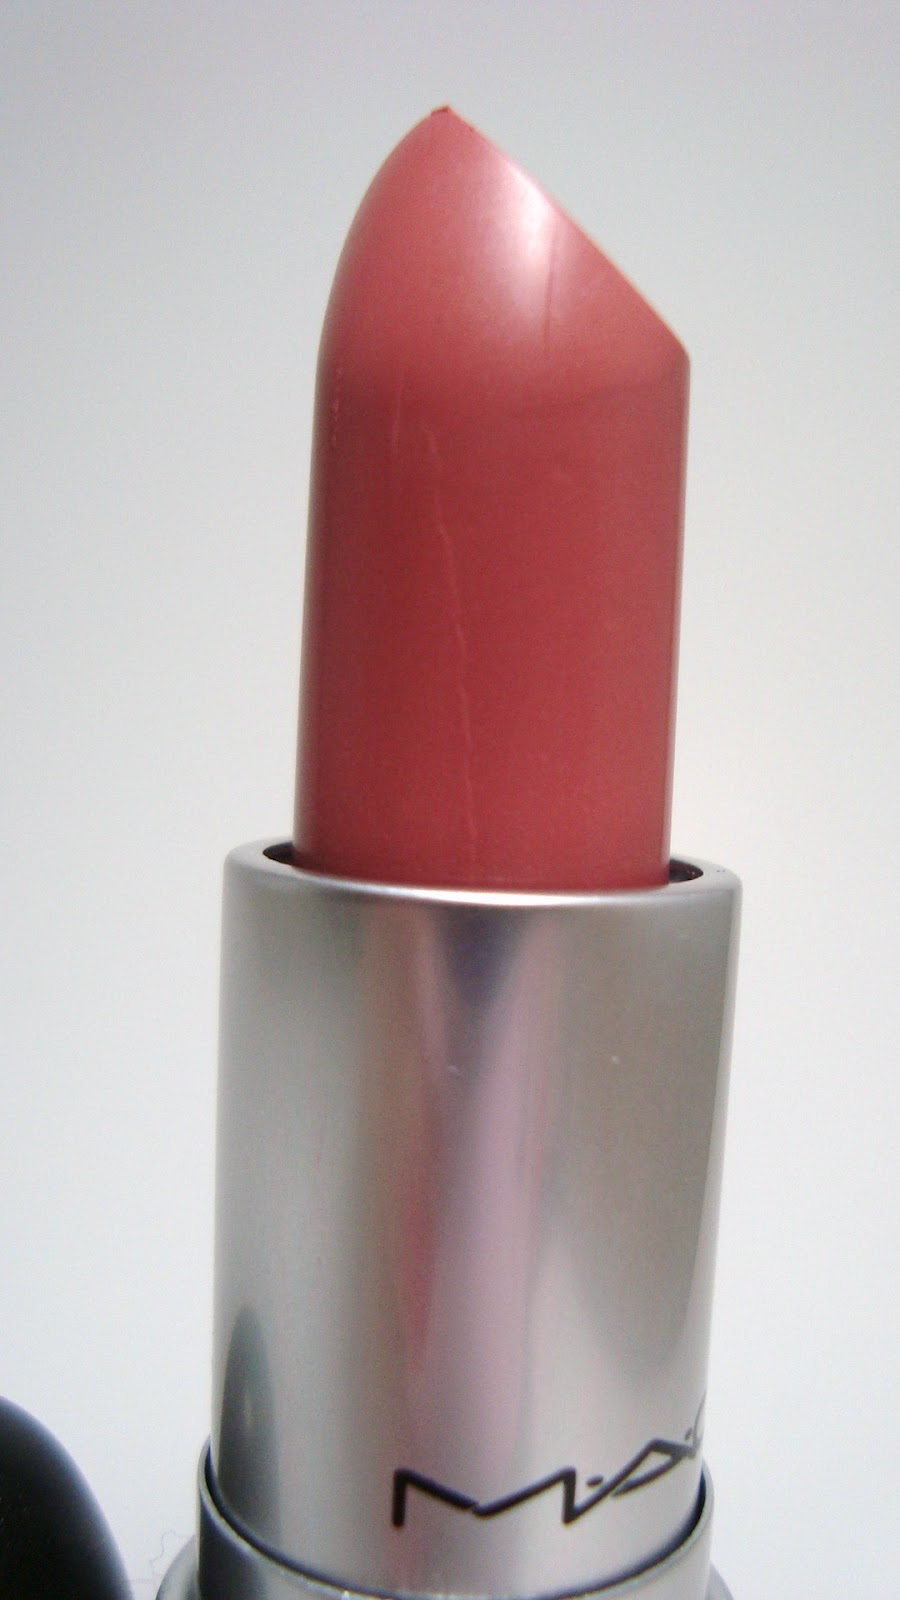 Mac Angel Dupe Wet N Wild 901b Lipstick Dupe